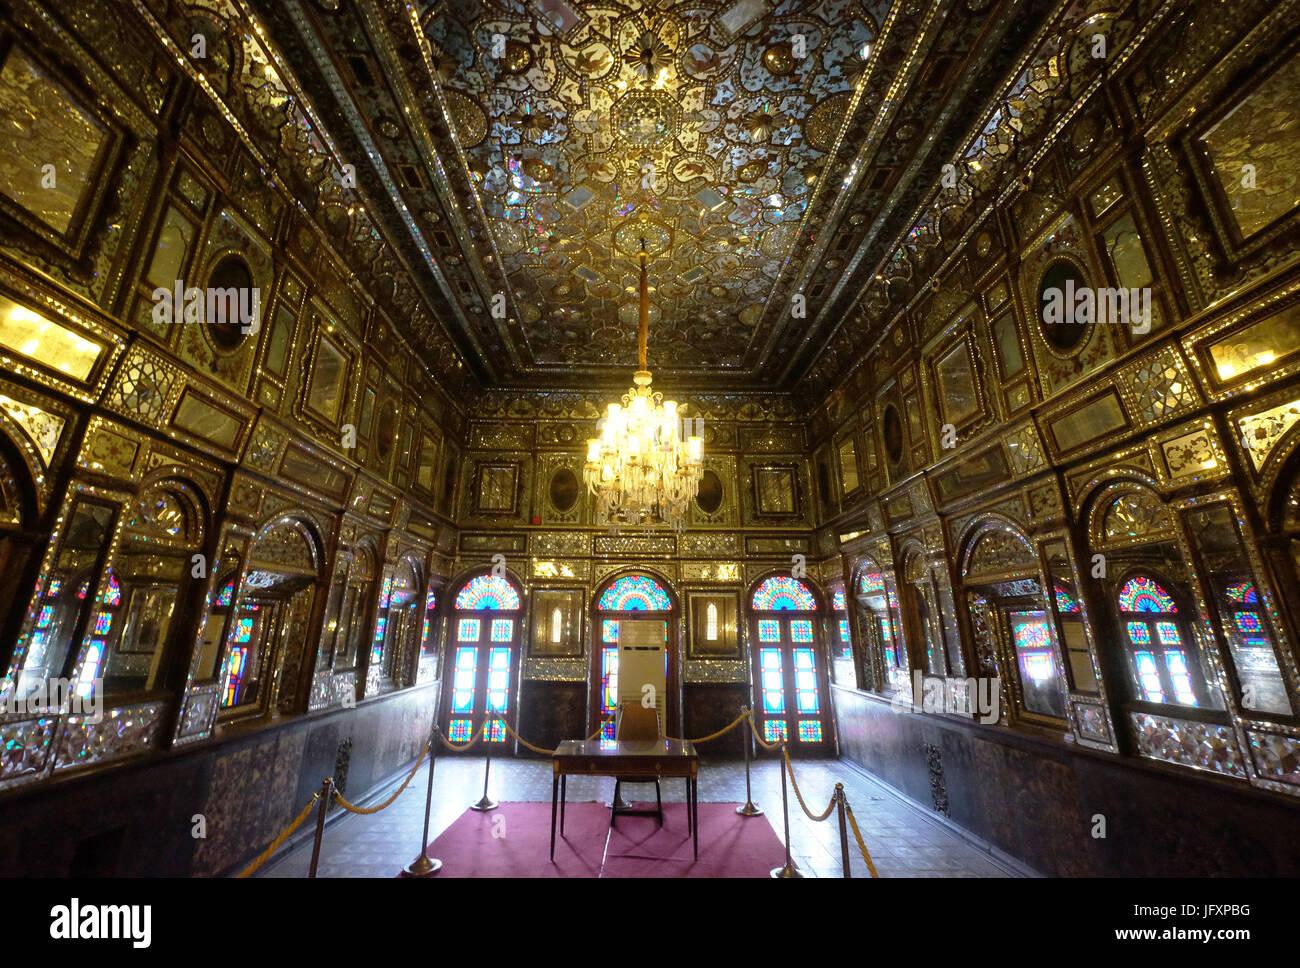 Golestan Palace Complex,Shams-Al Emarat (edifice of the sun),interior,Iran,Teheran - Stock Image